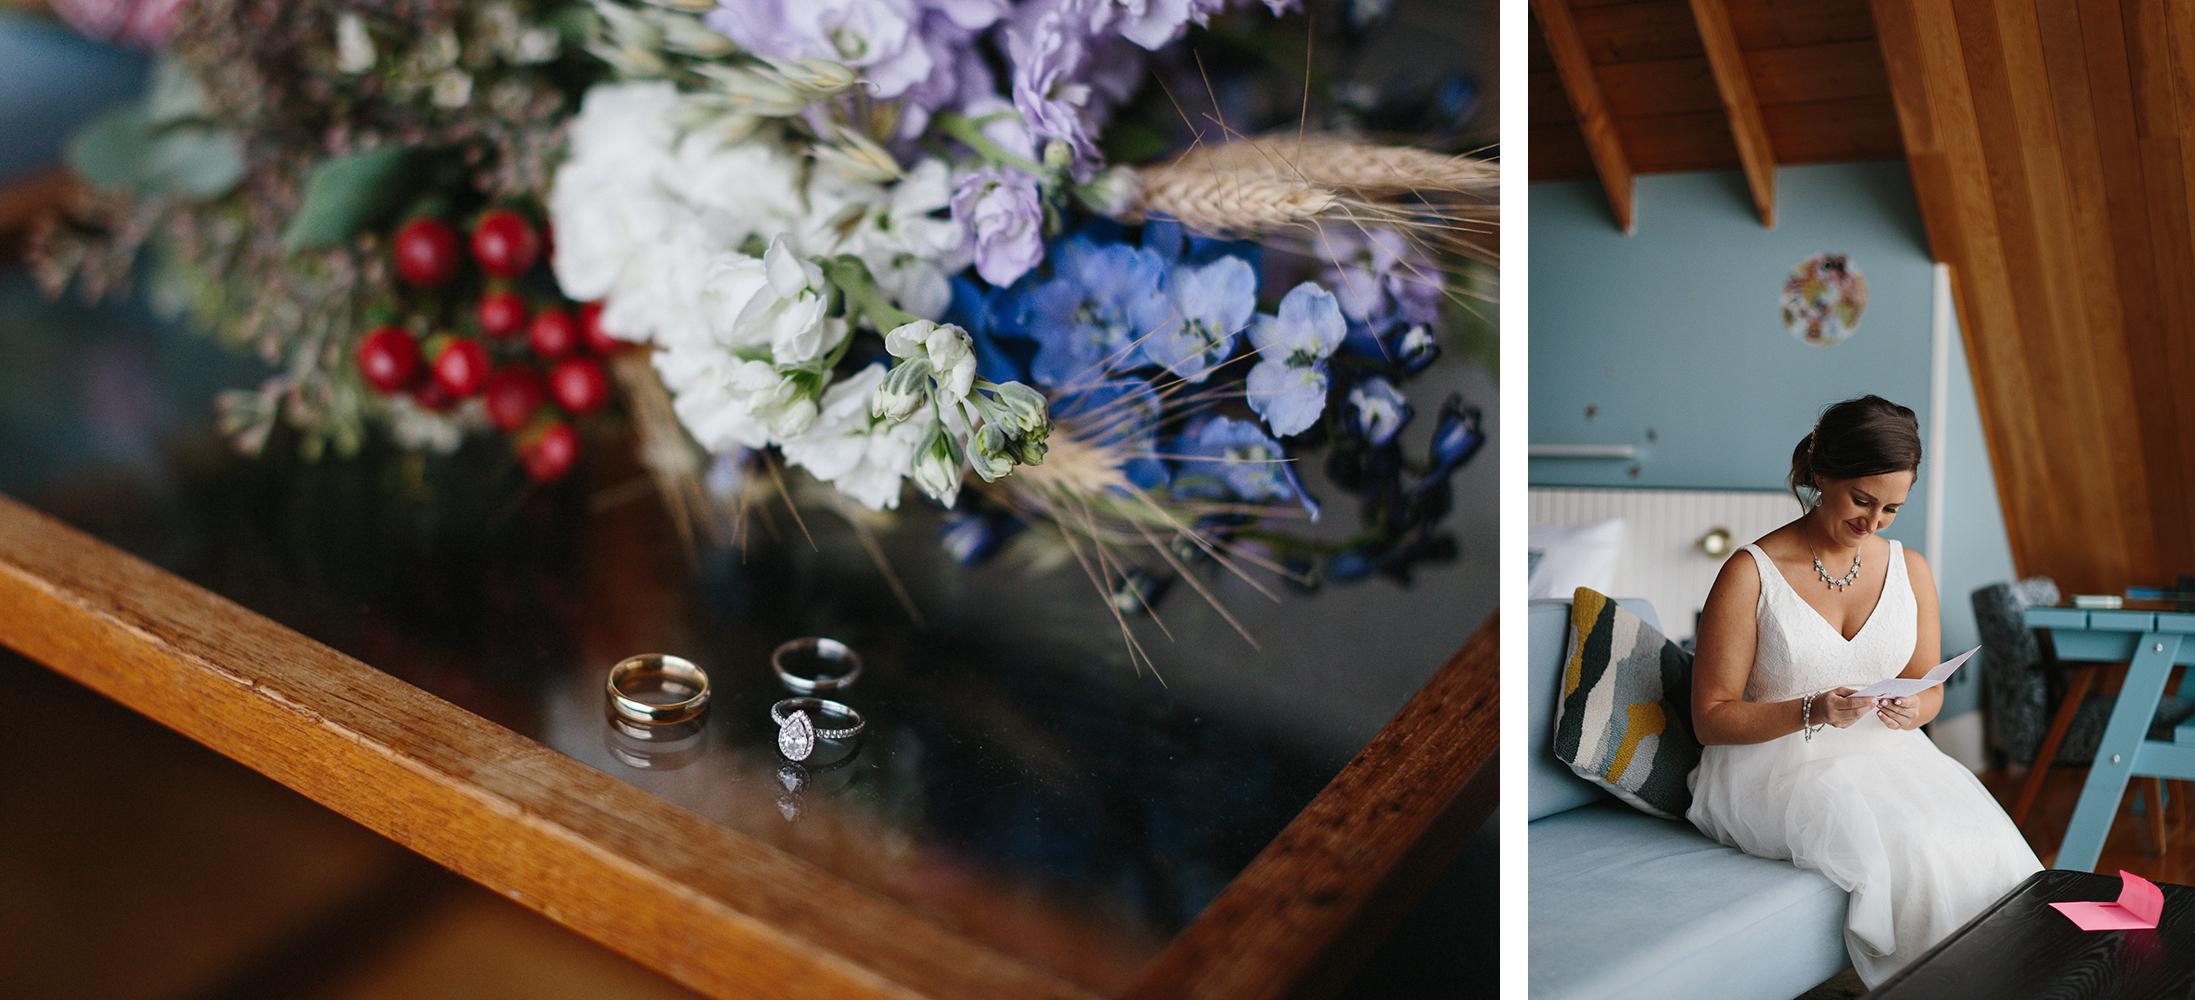 eganridge-resort-wedding-venue-real-wedding-toronto-wedding-photographer-3.jpg